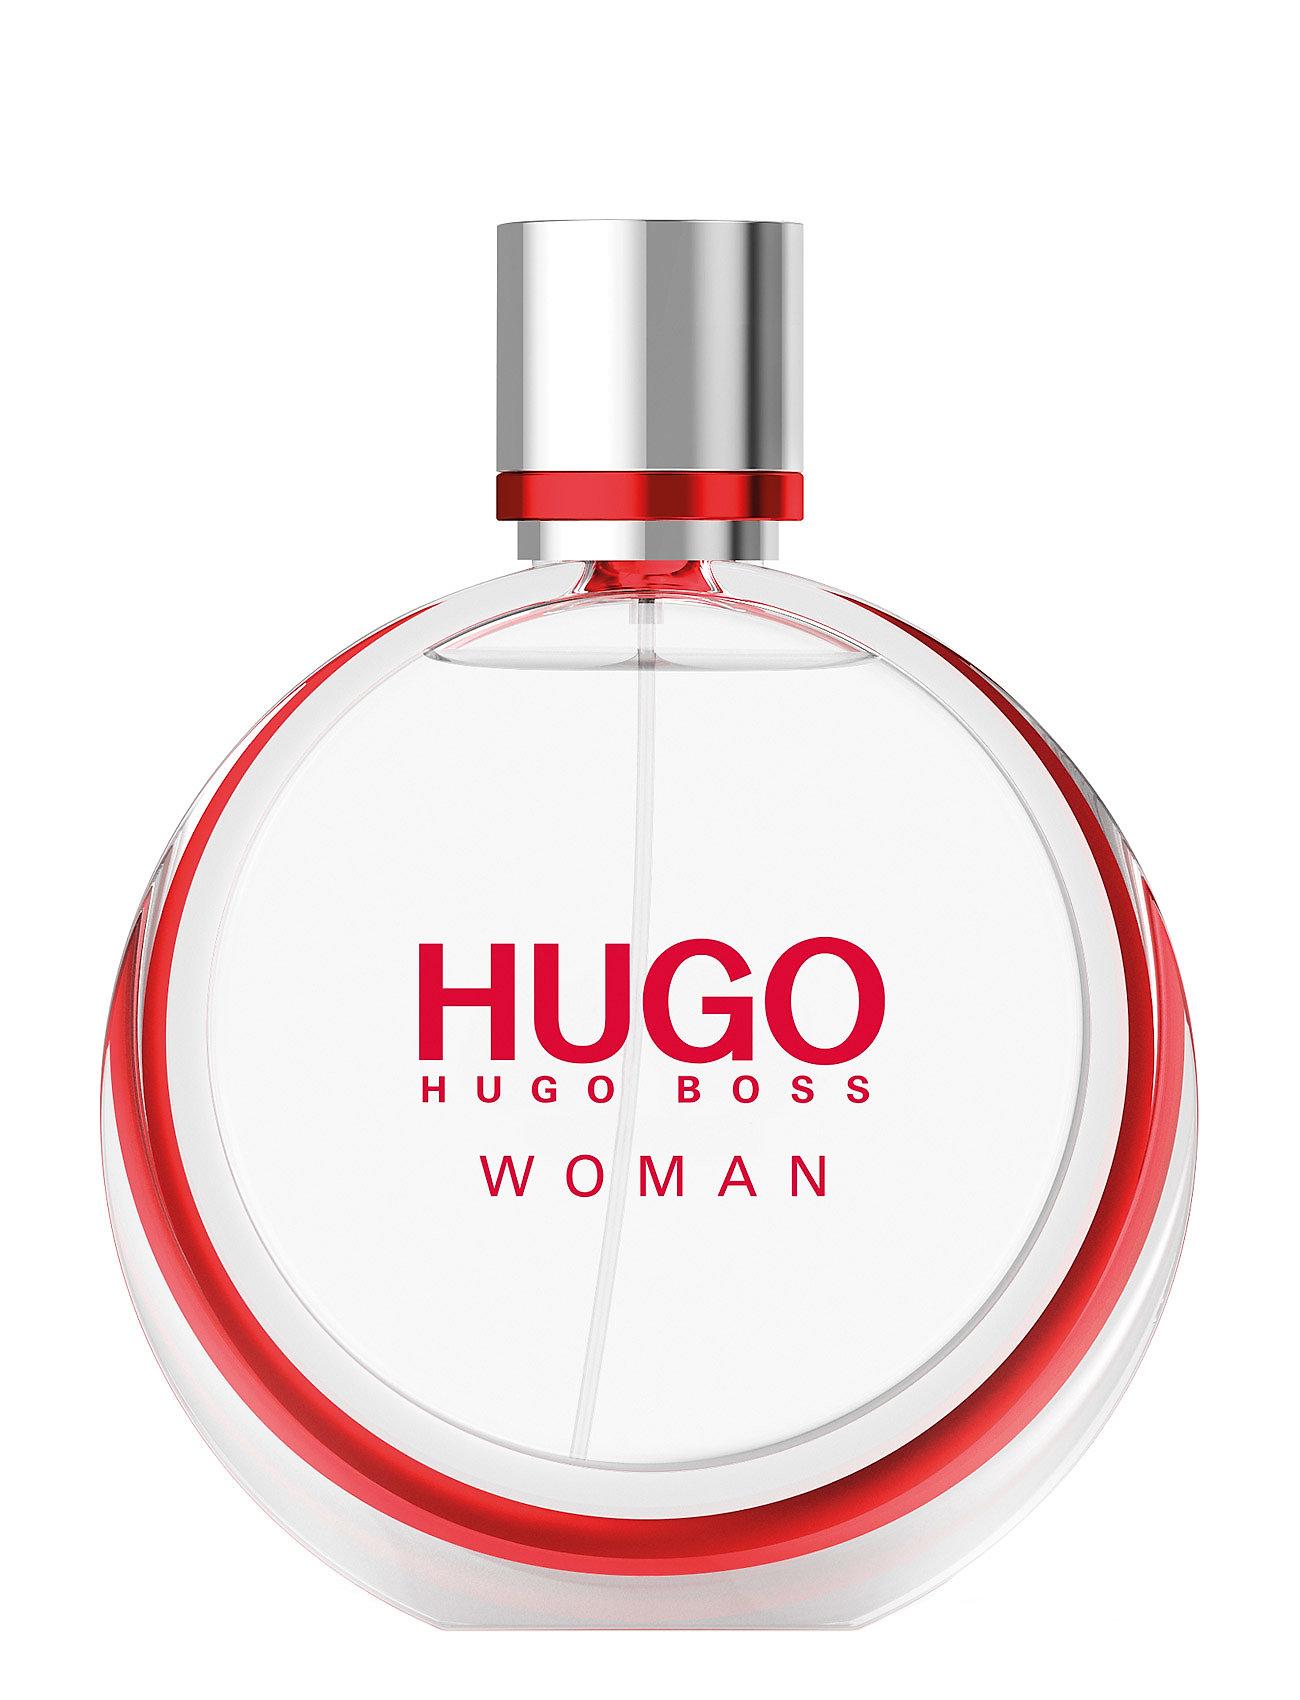 Image of Hugo Woman Eau De Parfum Parfume Eau De Parfum Nude Hugo Boss Fragrance (3372689685)